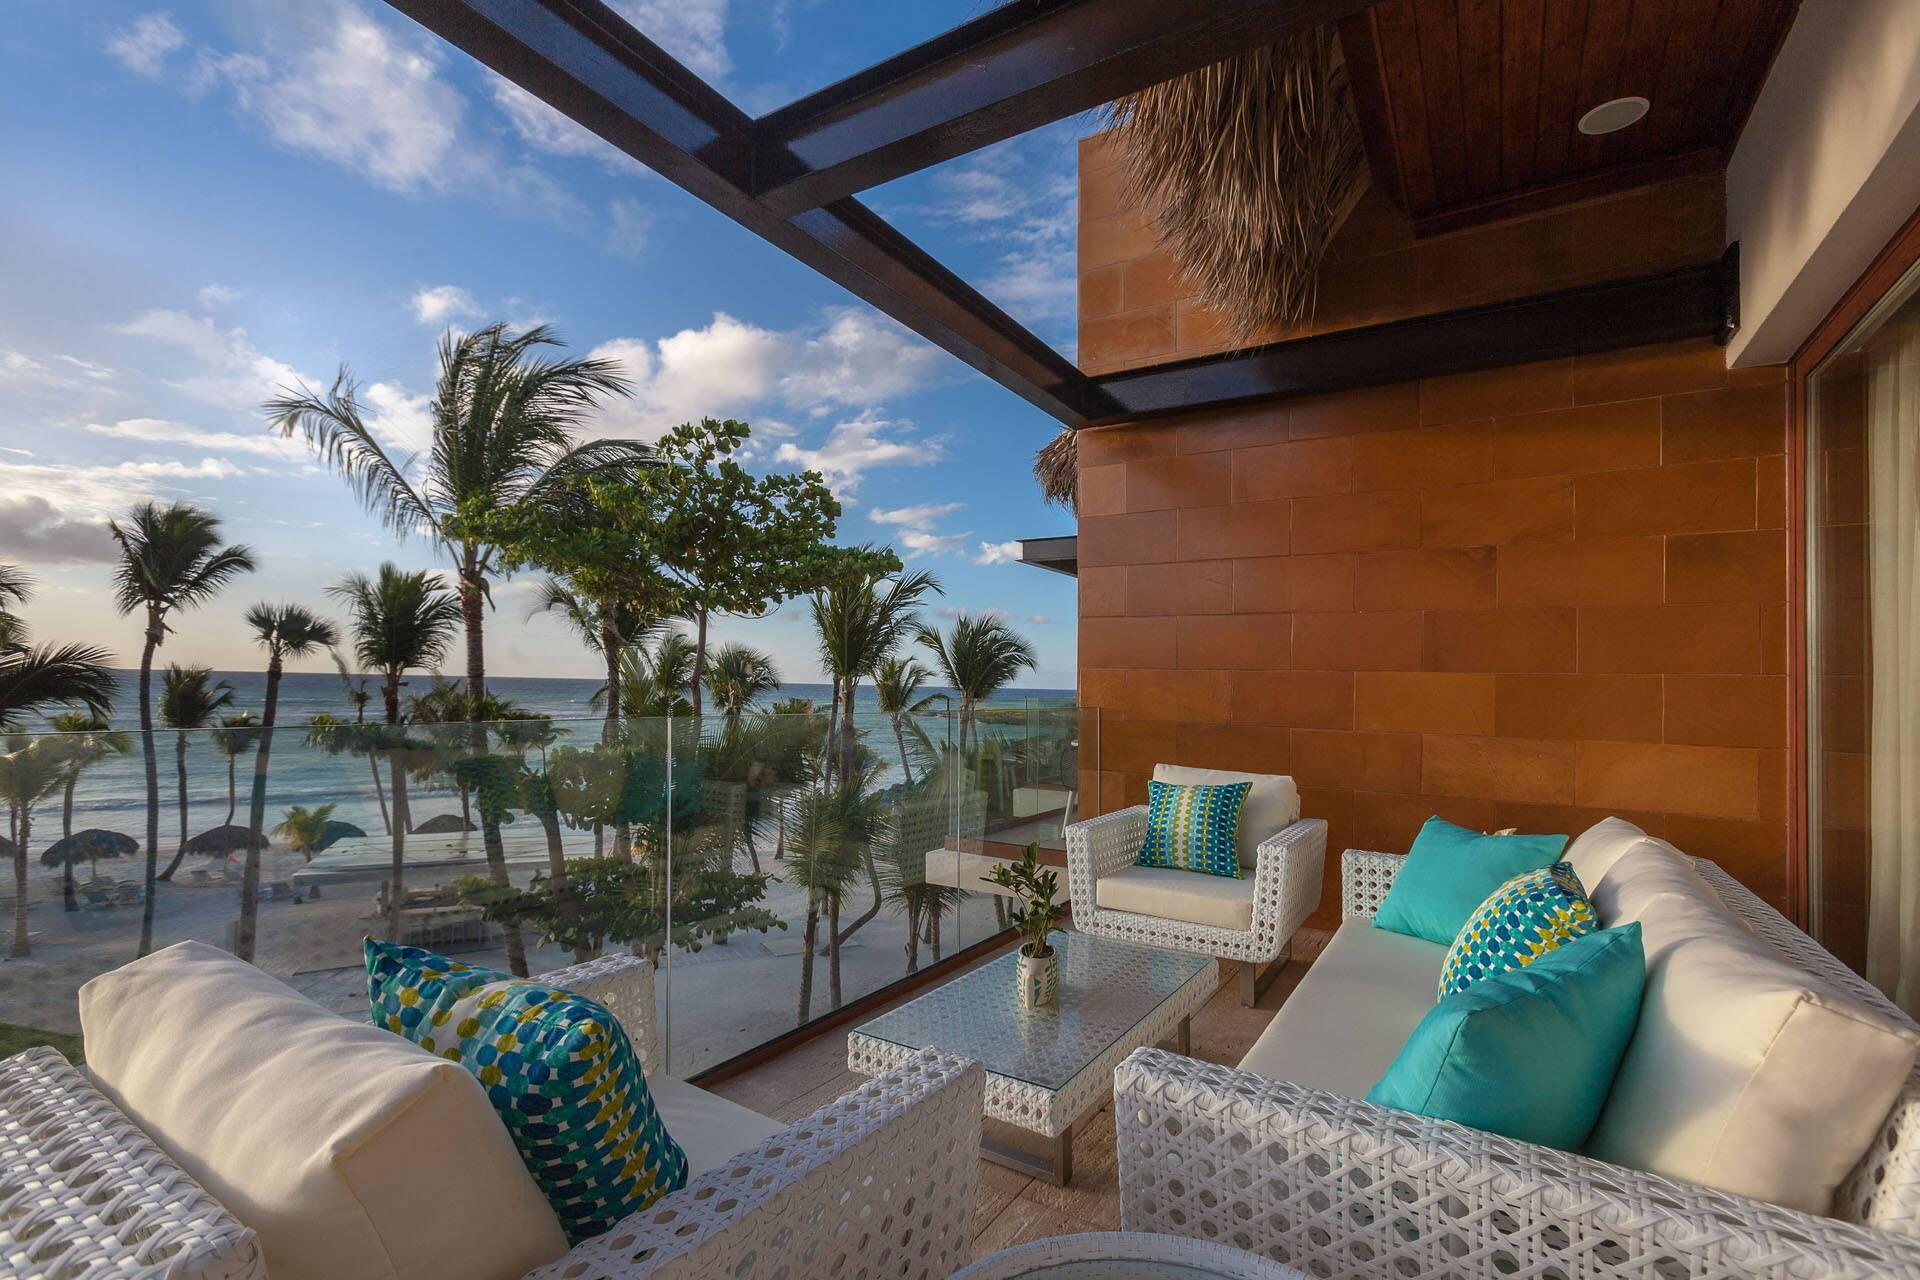 Eden Roc Cap Cana Punta Cana Rep Republicaine Beachfront Suite Terrasse